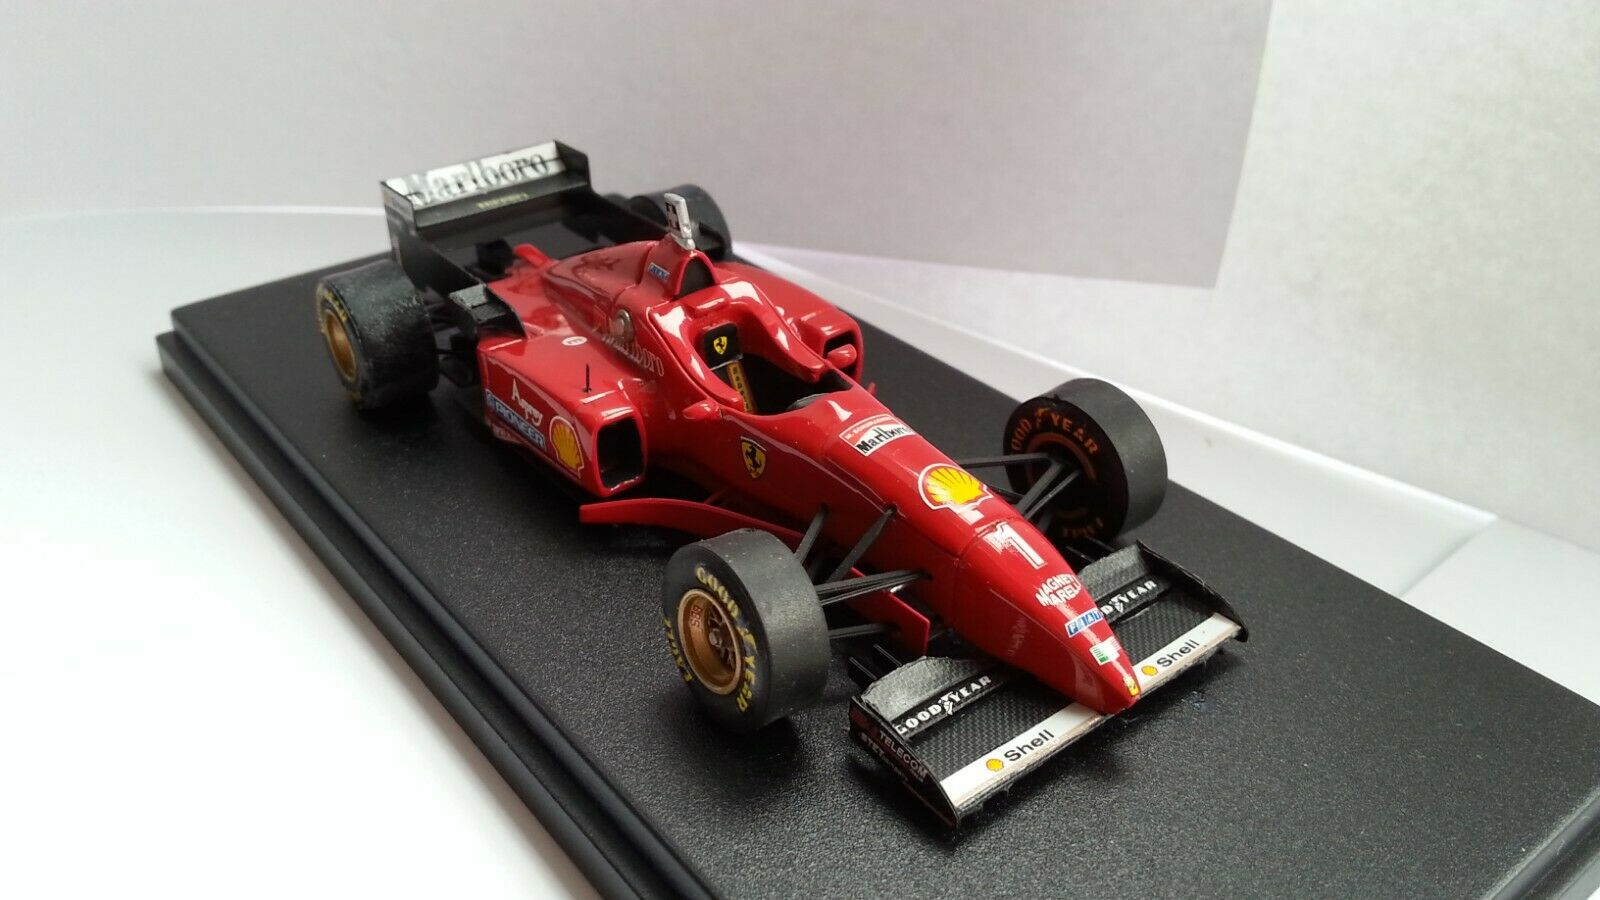 Ferrari F310 nariz baja Schumacher GP Australia 1996 BBR Models fábrica construido